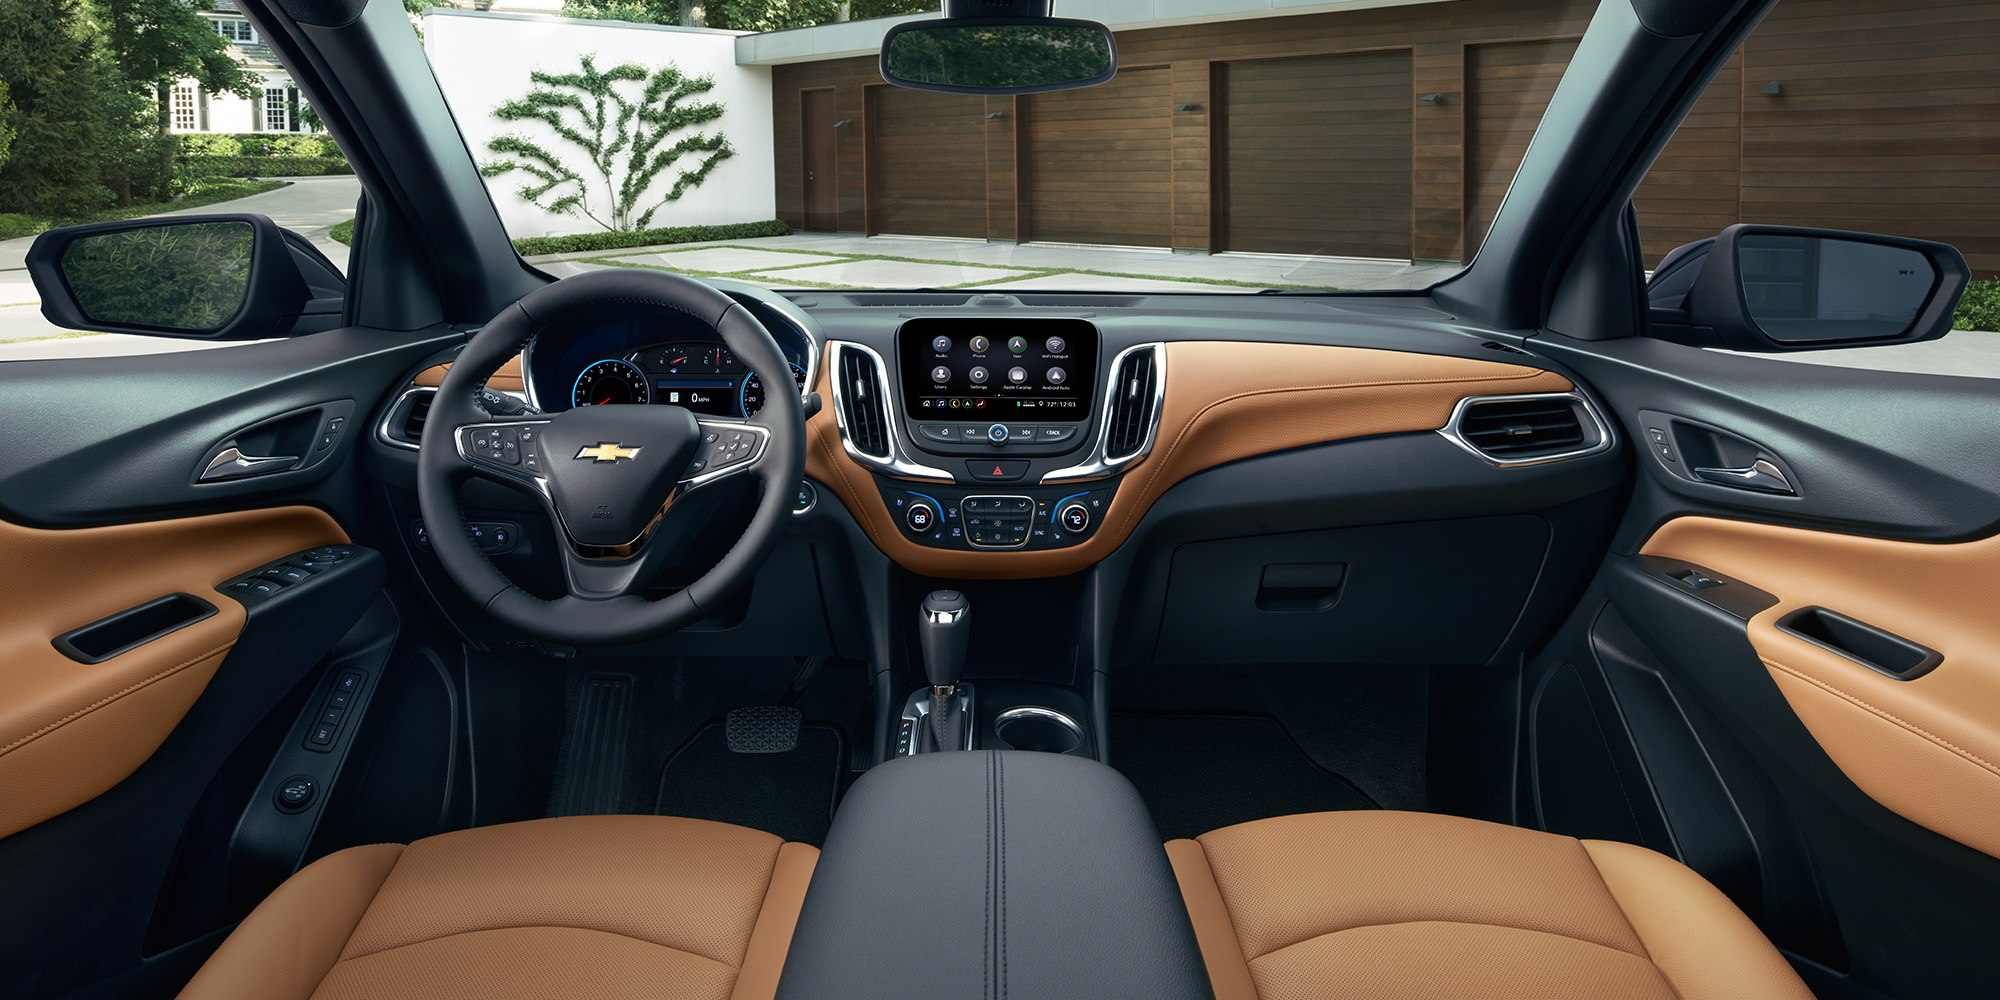 2019 Chevrolet Equinox Financing near Orland Park, IL - Kingdom